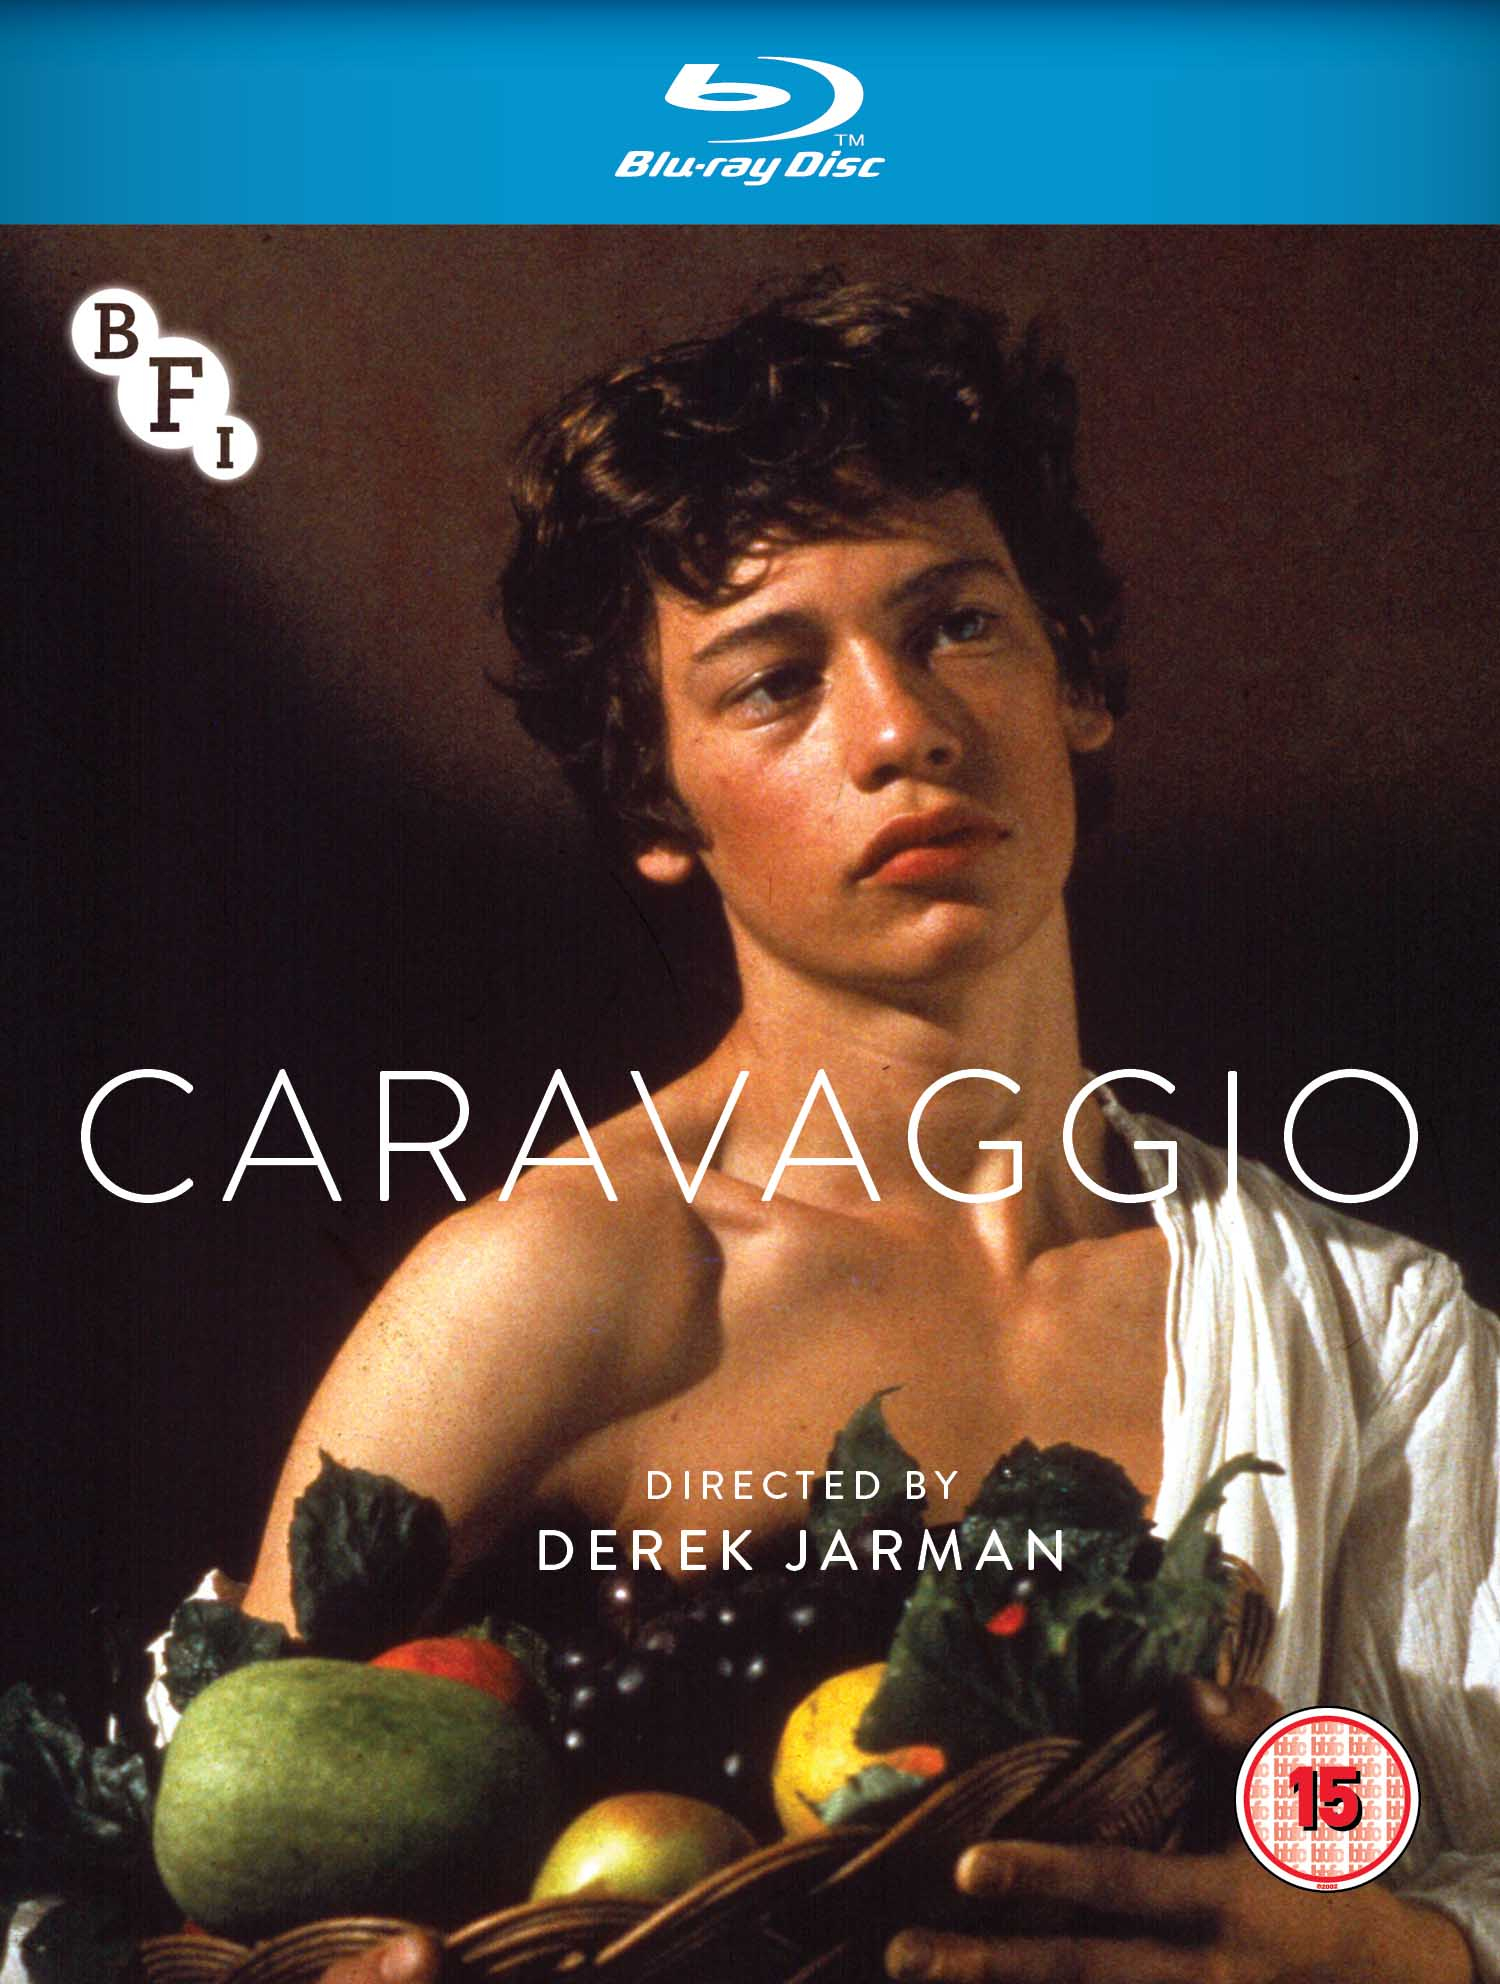 Buy PRE-ORDER Caravaggio (Blu-ray)